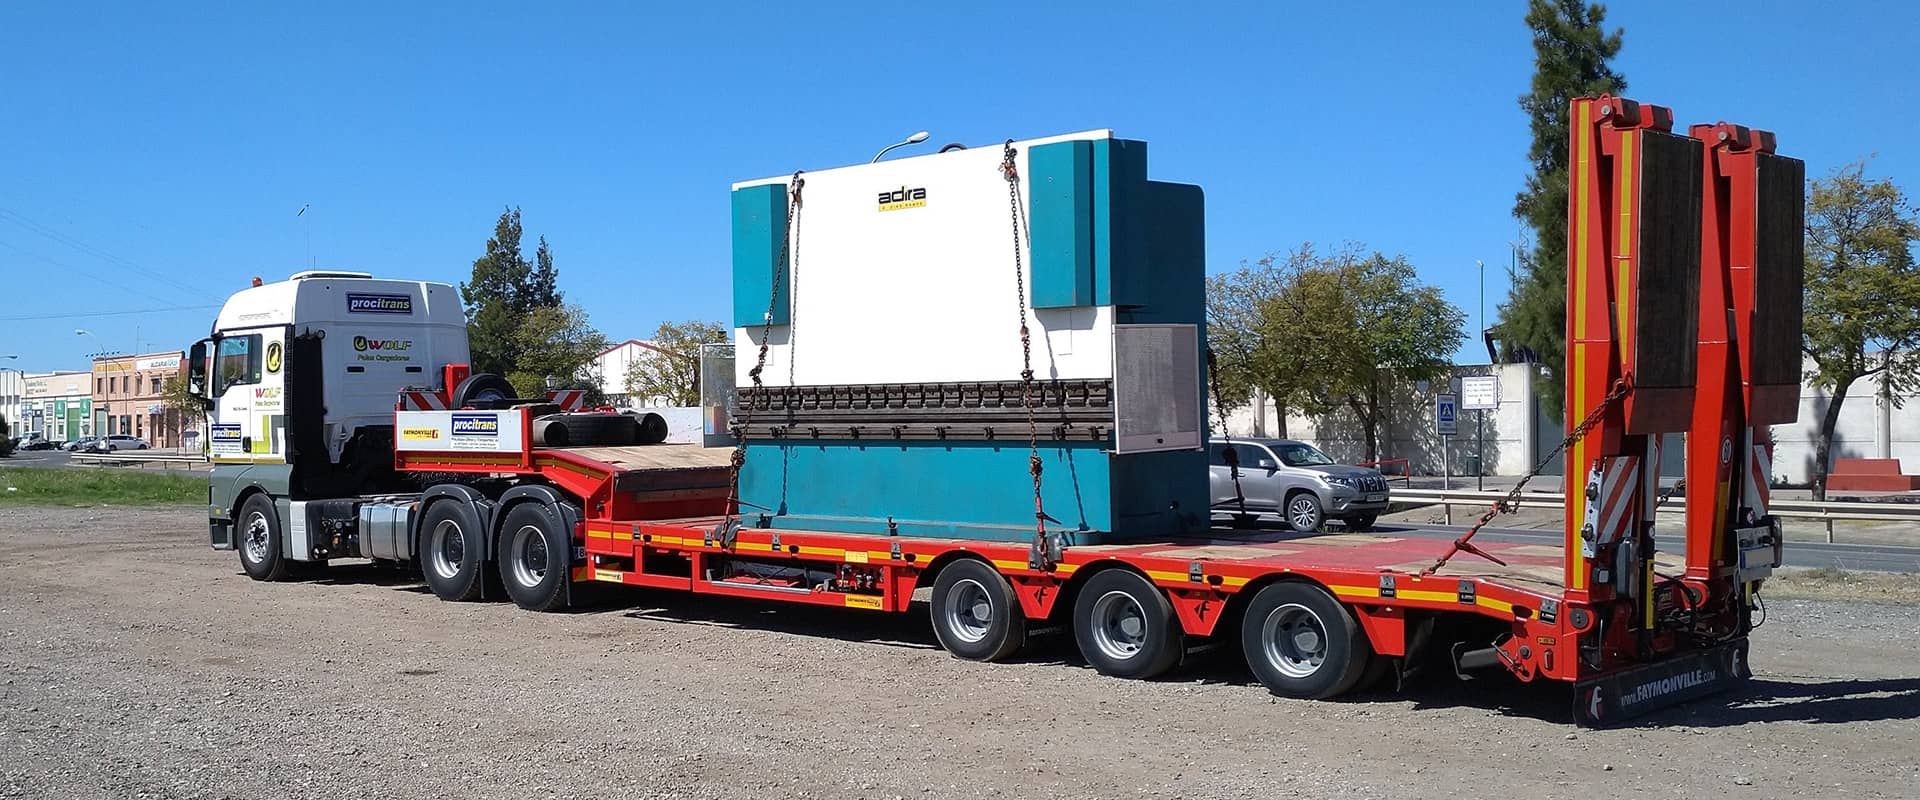 heavy equipment transport Procitrans 4